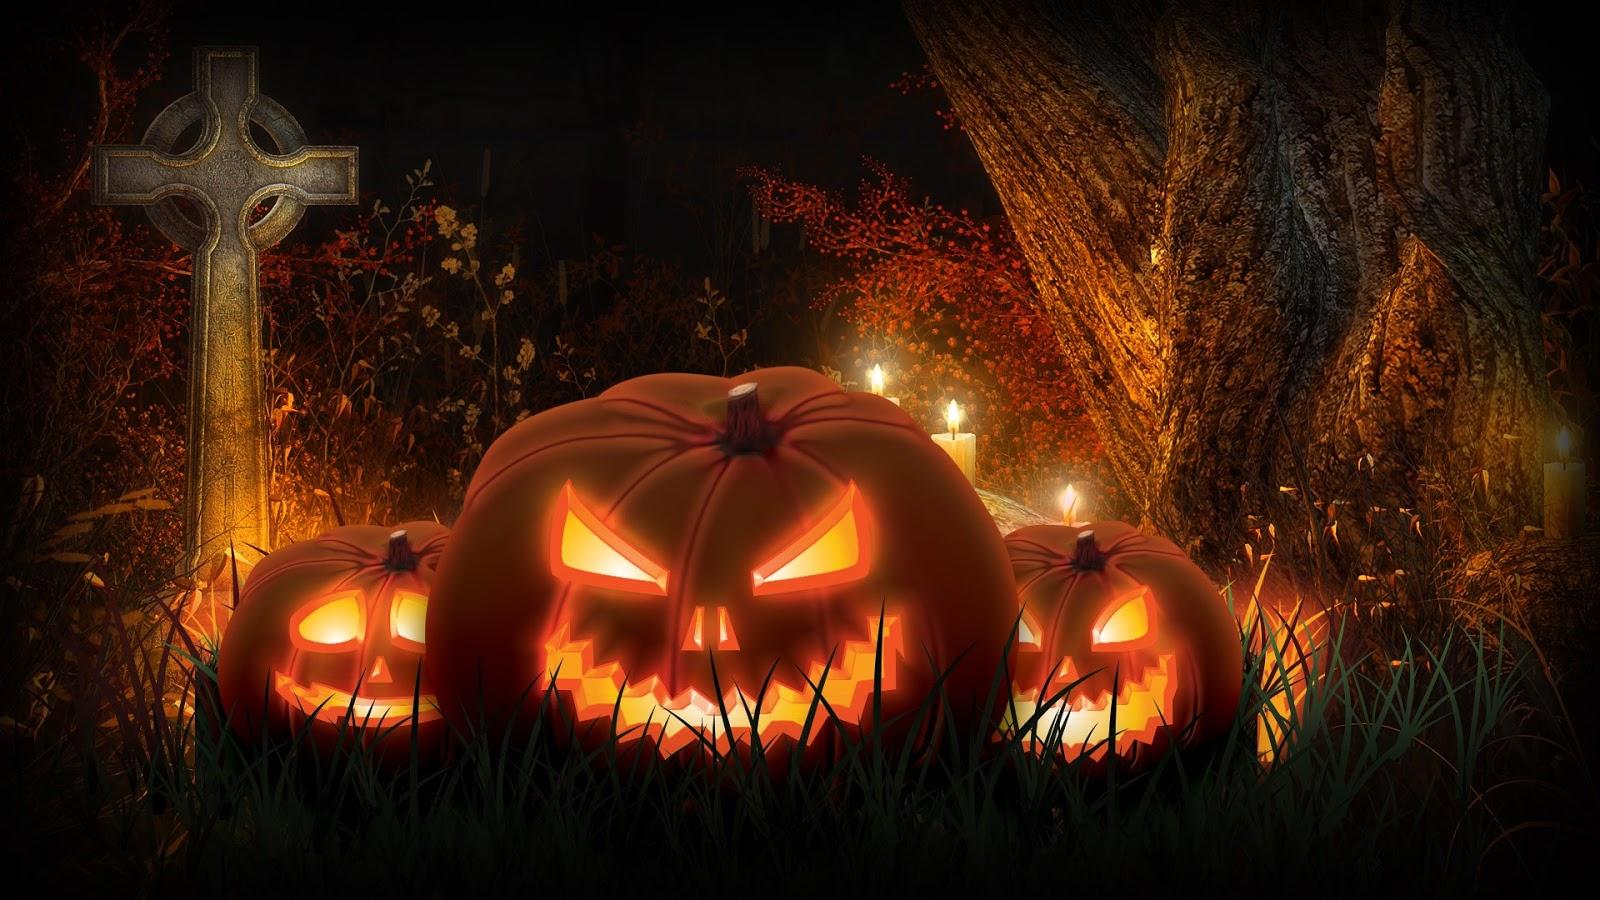 Scary Halloween Jack O'Lanterns